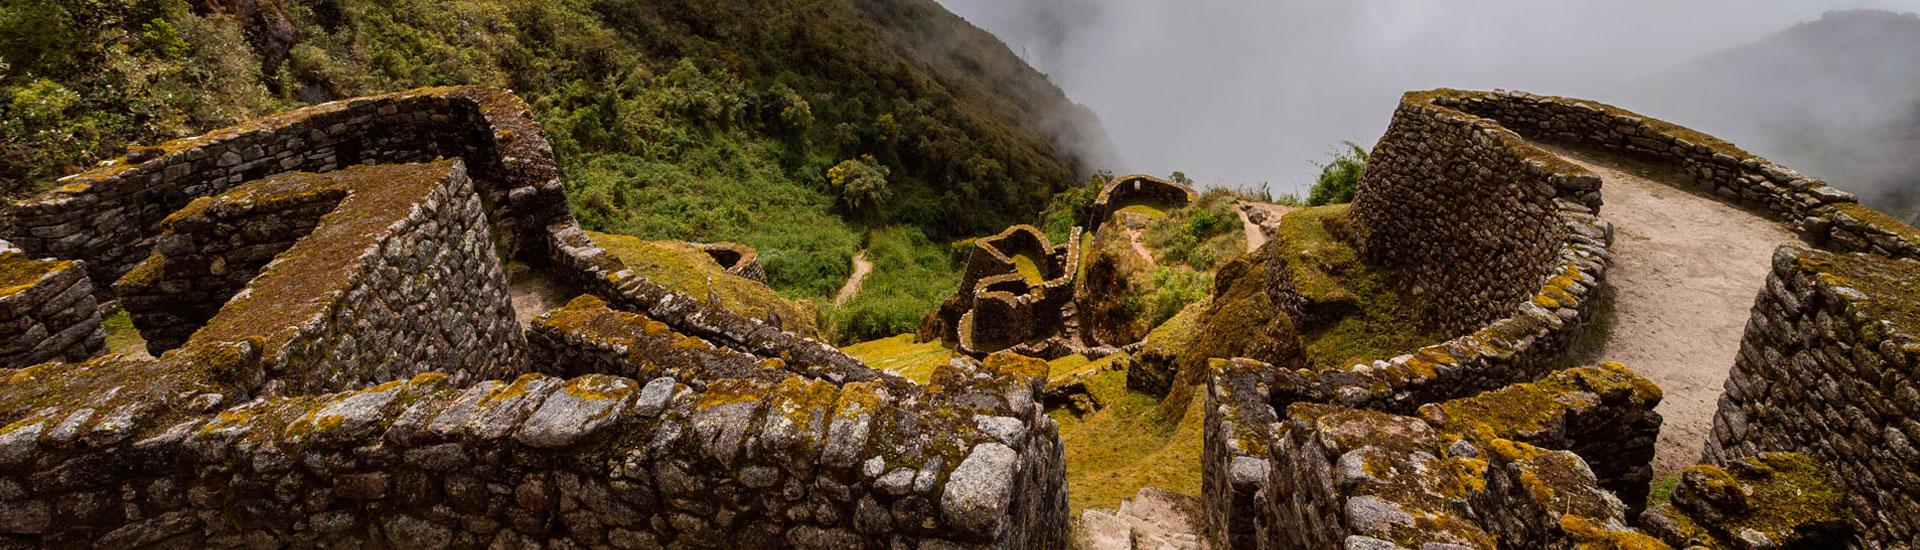 Inca Trail to Machu Picchu 04 Days / 03 Nights (Group Service)